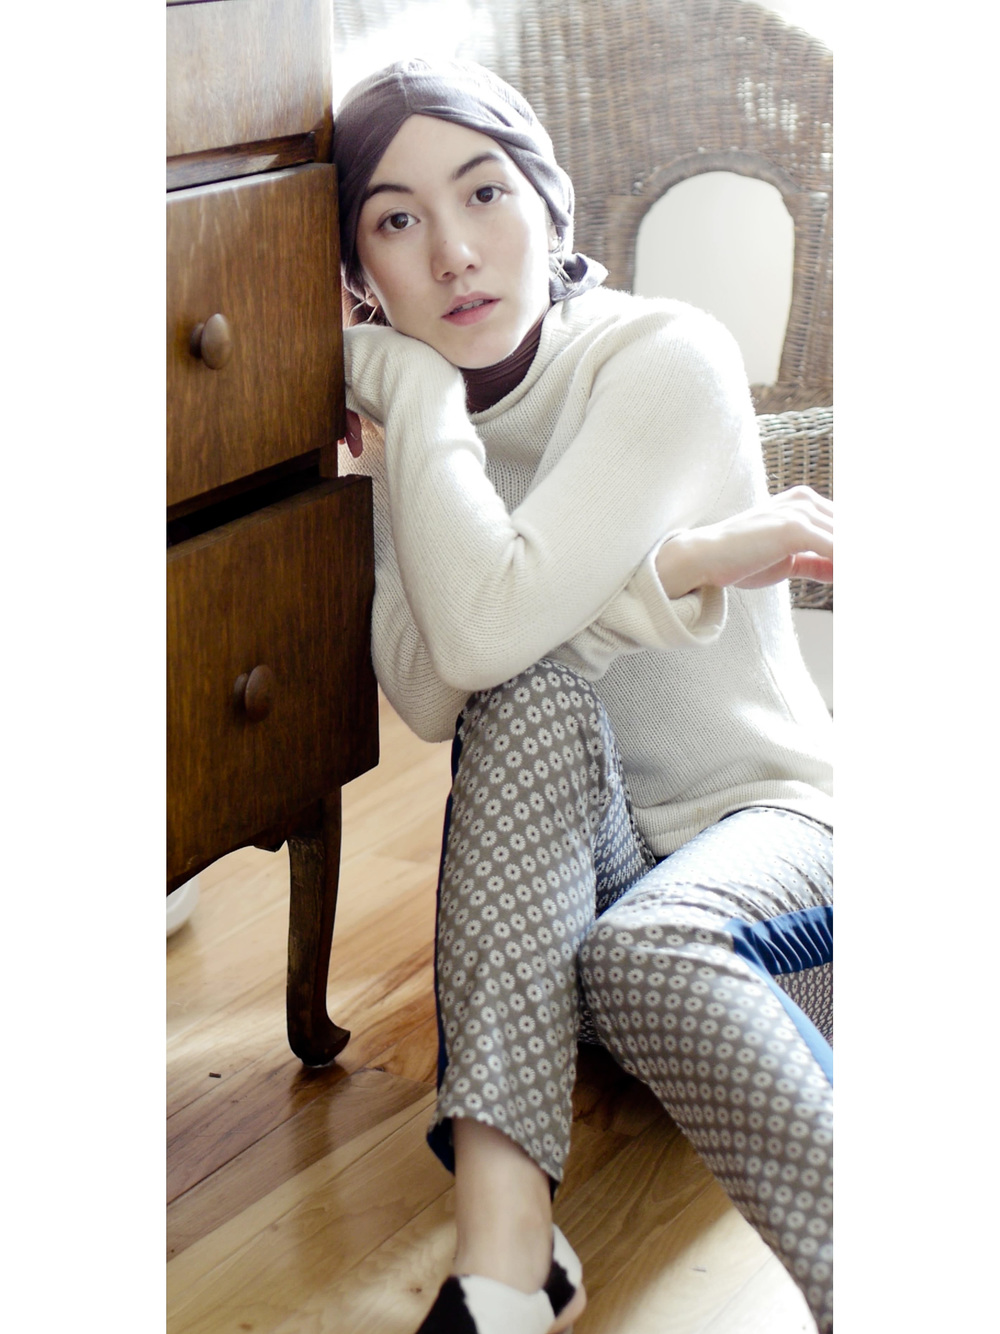 Uniqlo x Hana Tajima Spring 2016